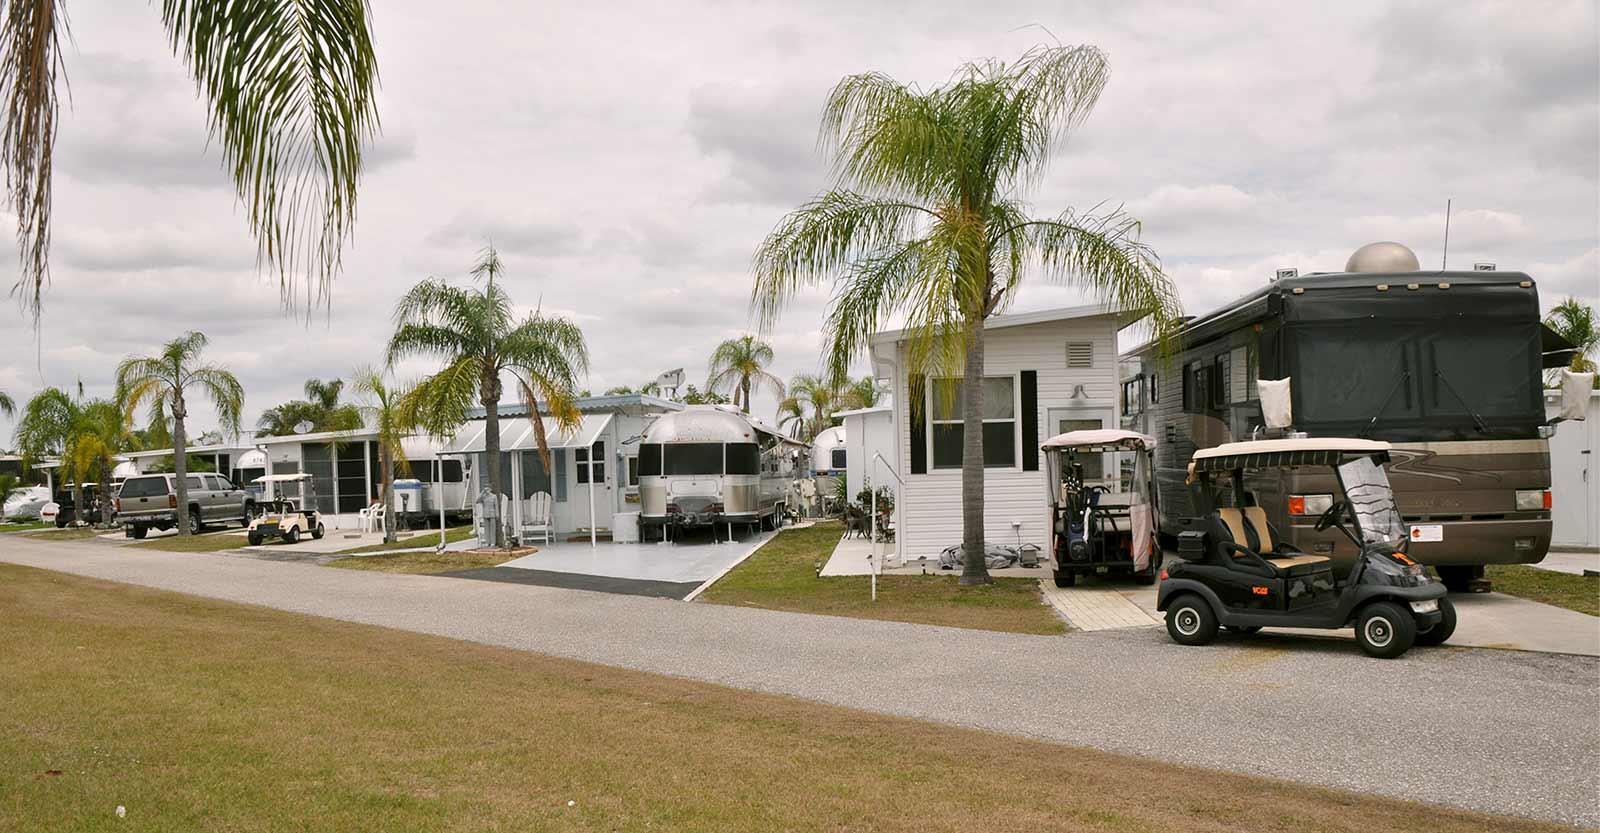 Paradise Park, Punta Gorda, Florida